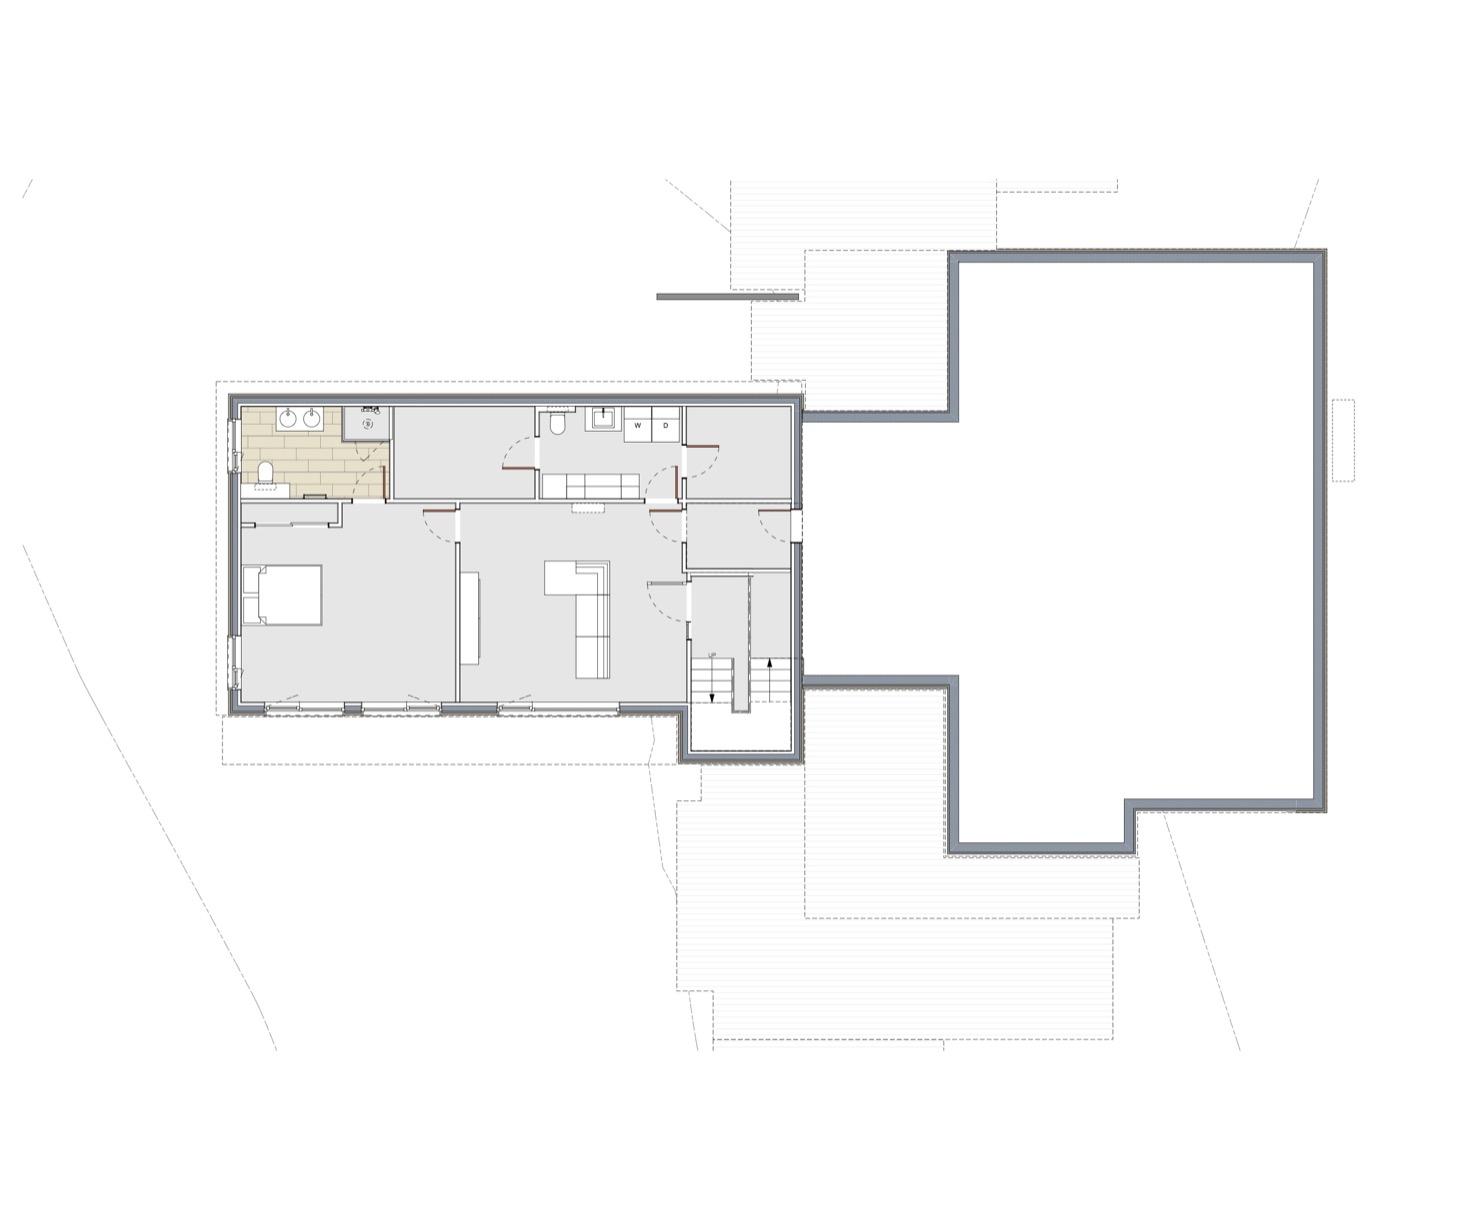 cld-garden-level-1473.jpg